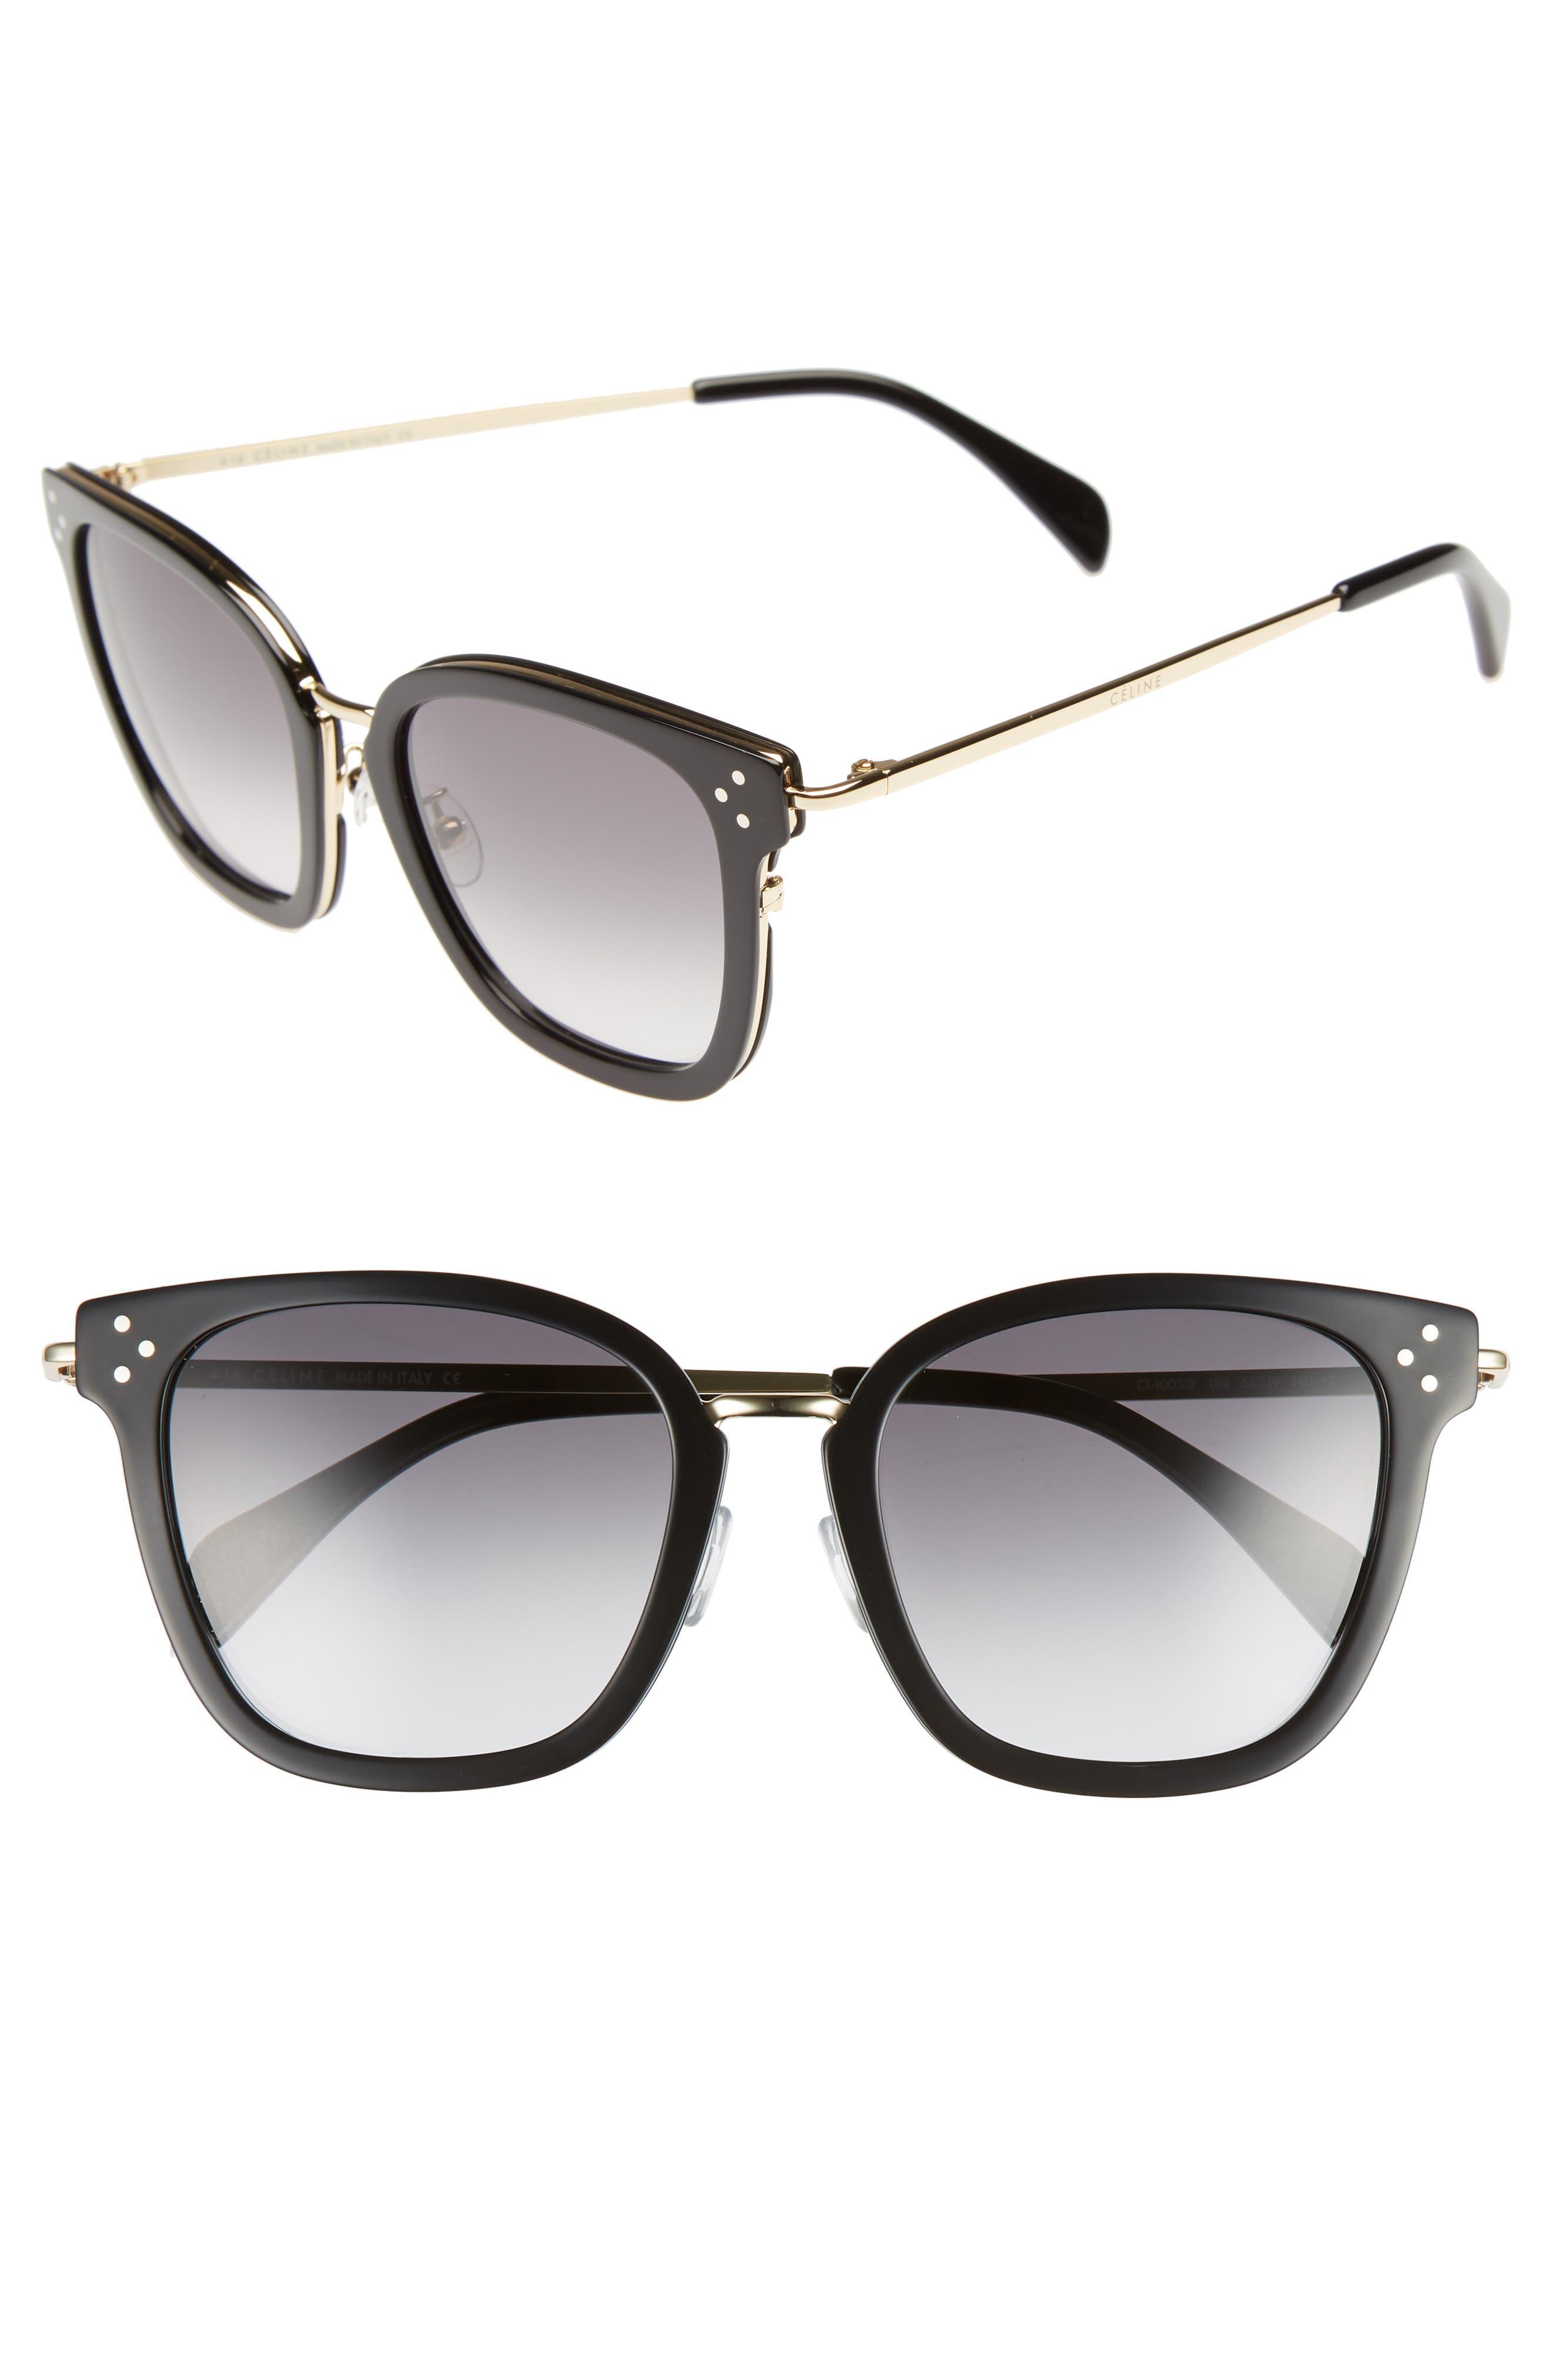 CELINE Special Fit 54mm Sunglasses, Main, color, BLACK/ GOLD/ SMOKE